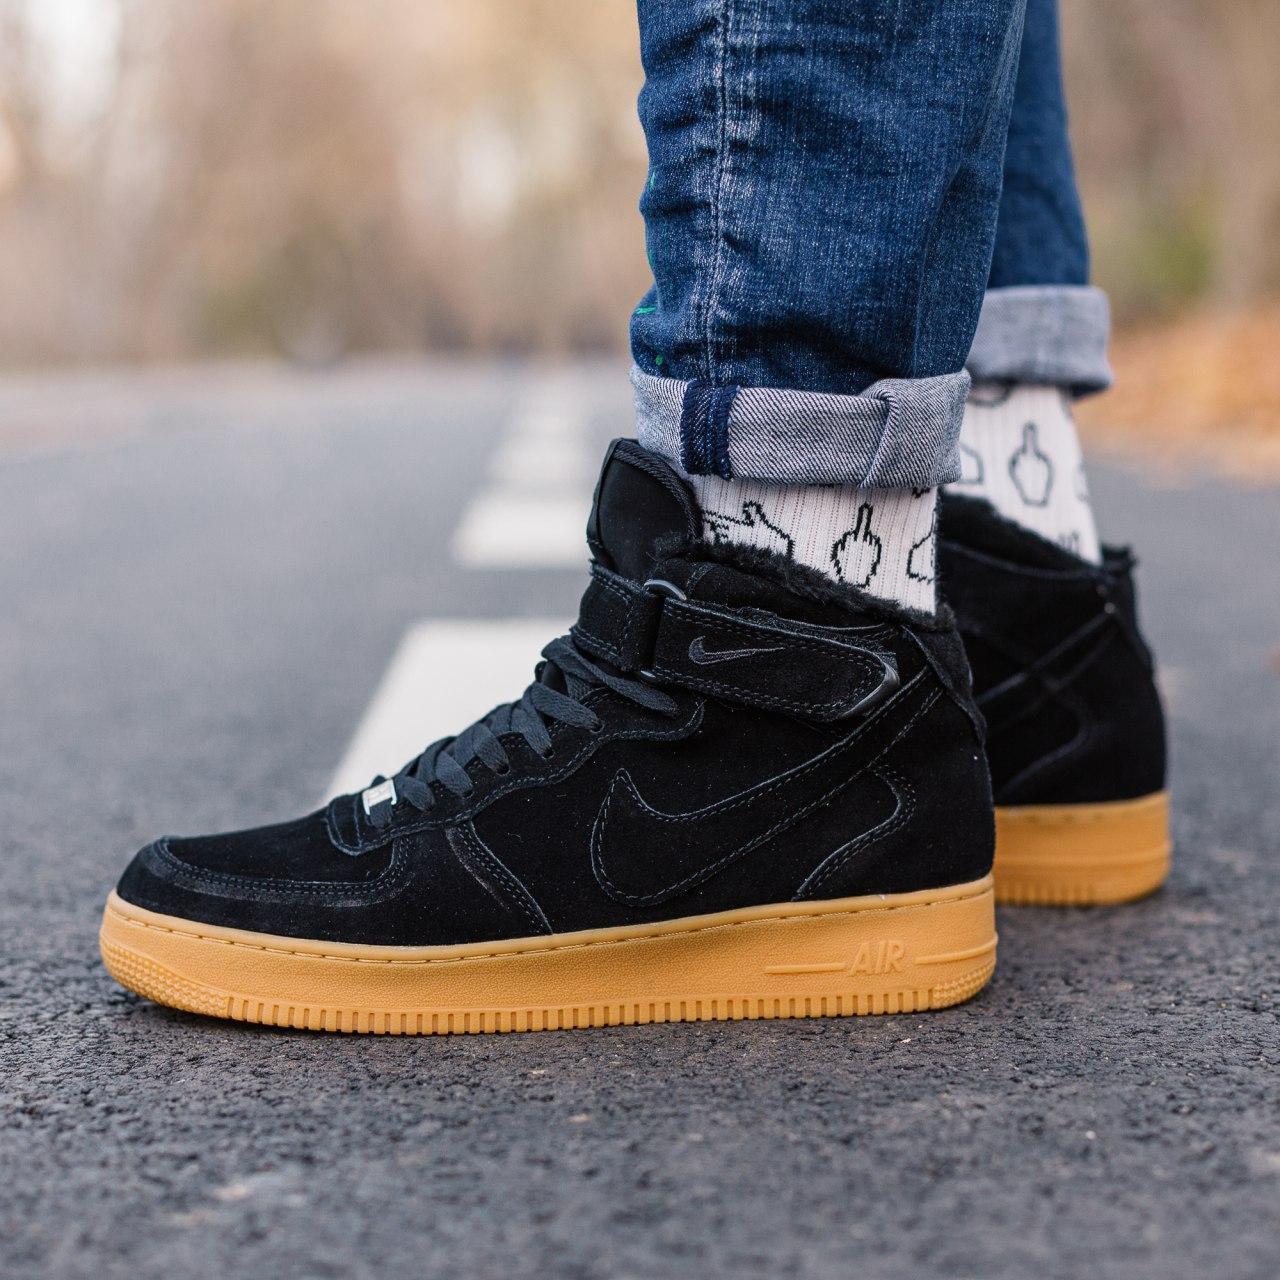 Кроссовки зимние Nike Air Force high black (Реплика ААА)